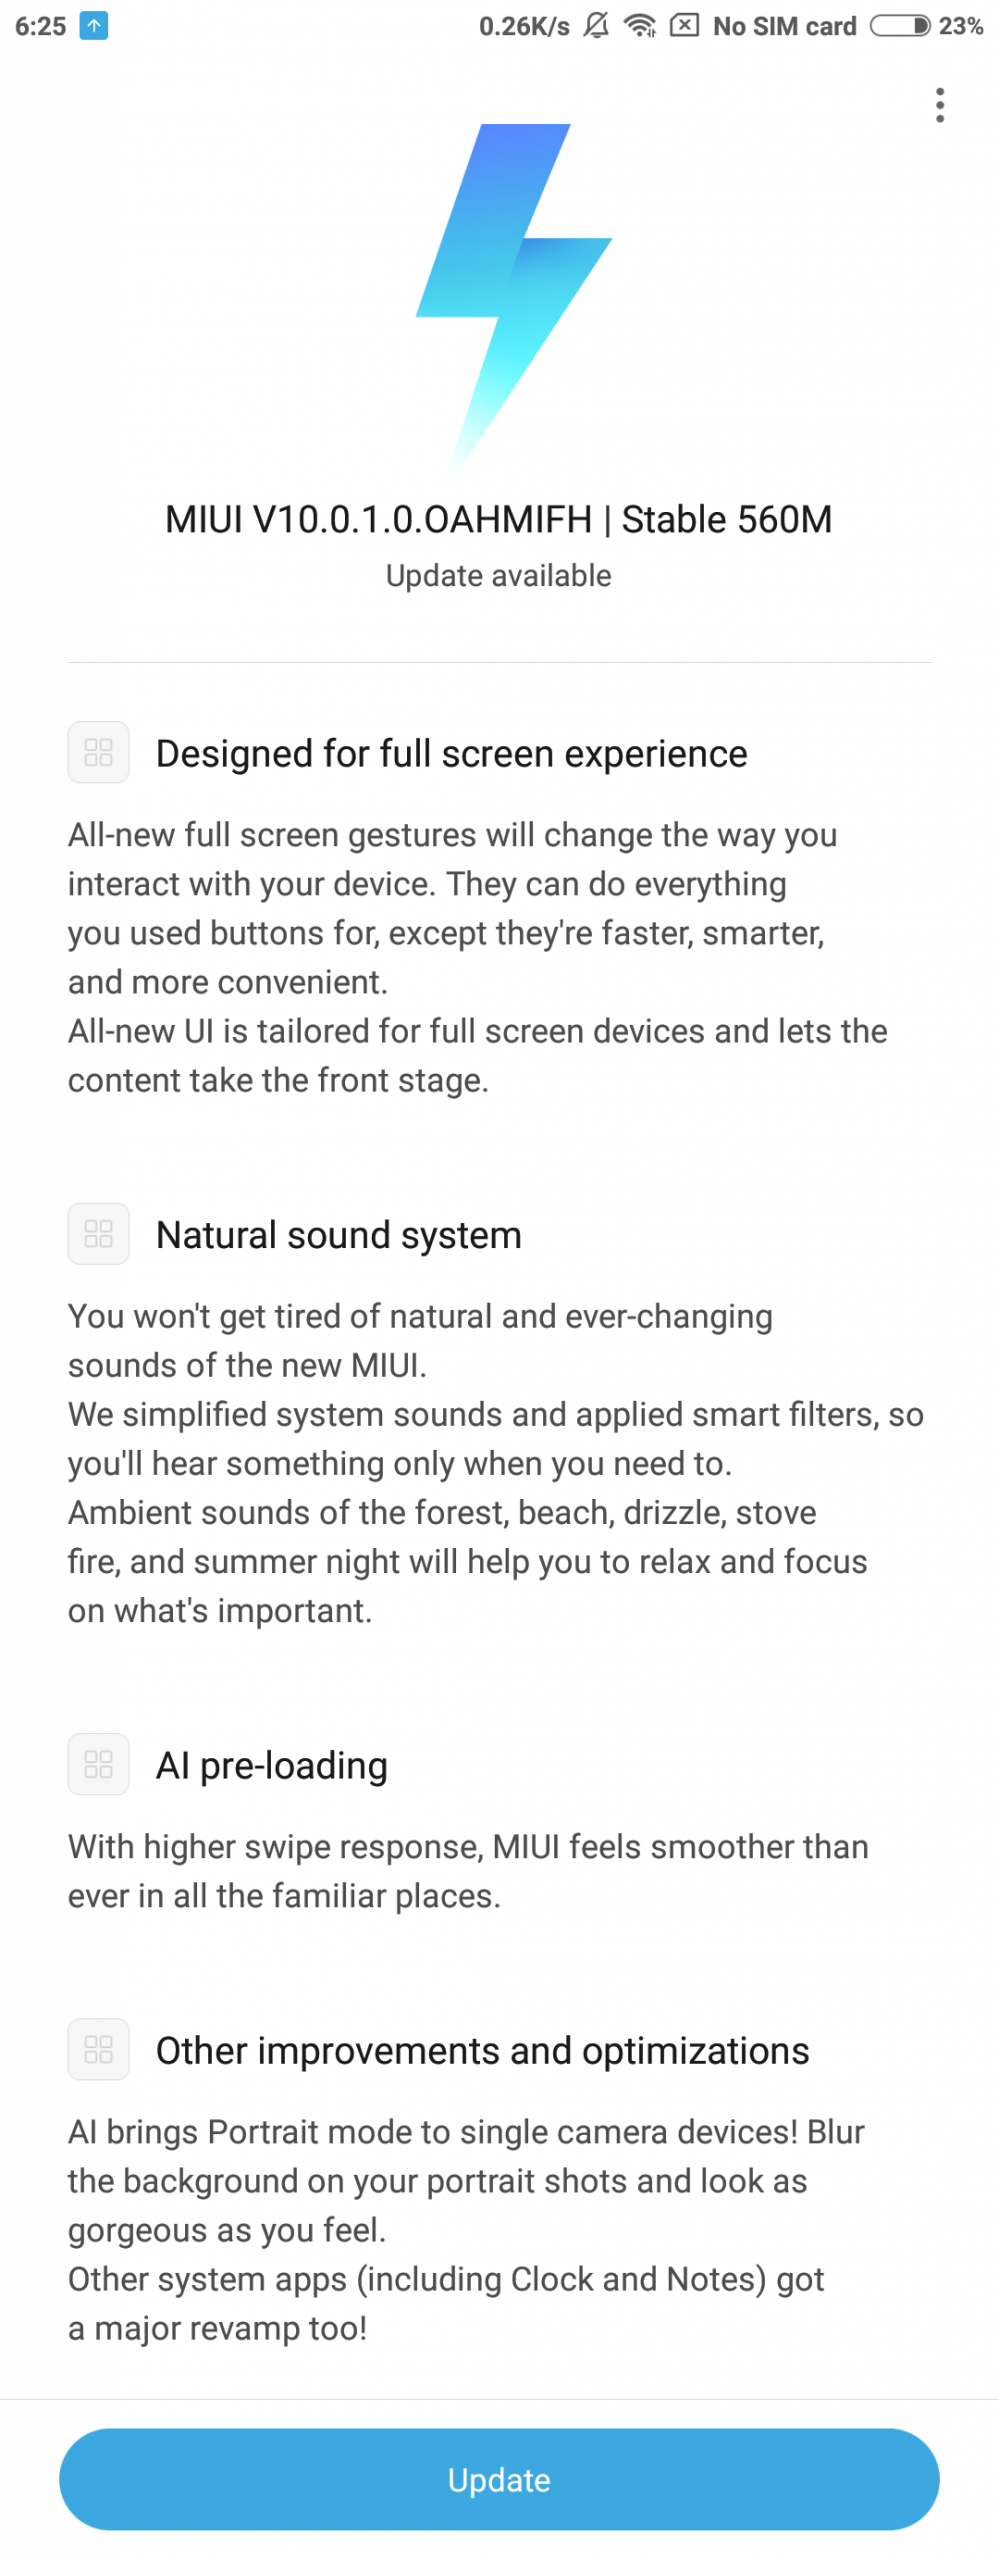 Screenshot_2018-09-19-06-25-25-906_com.android.updater.png